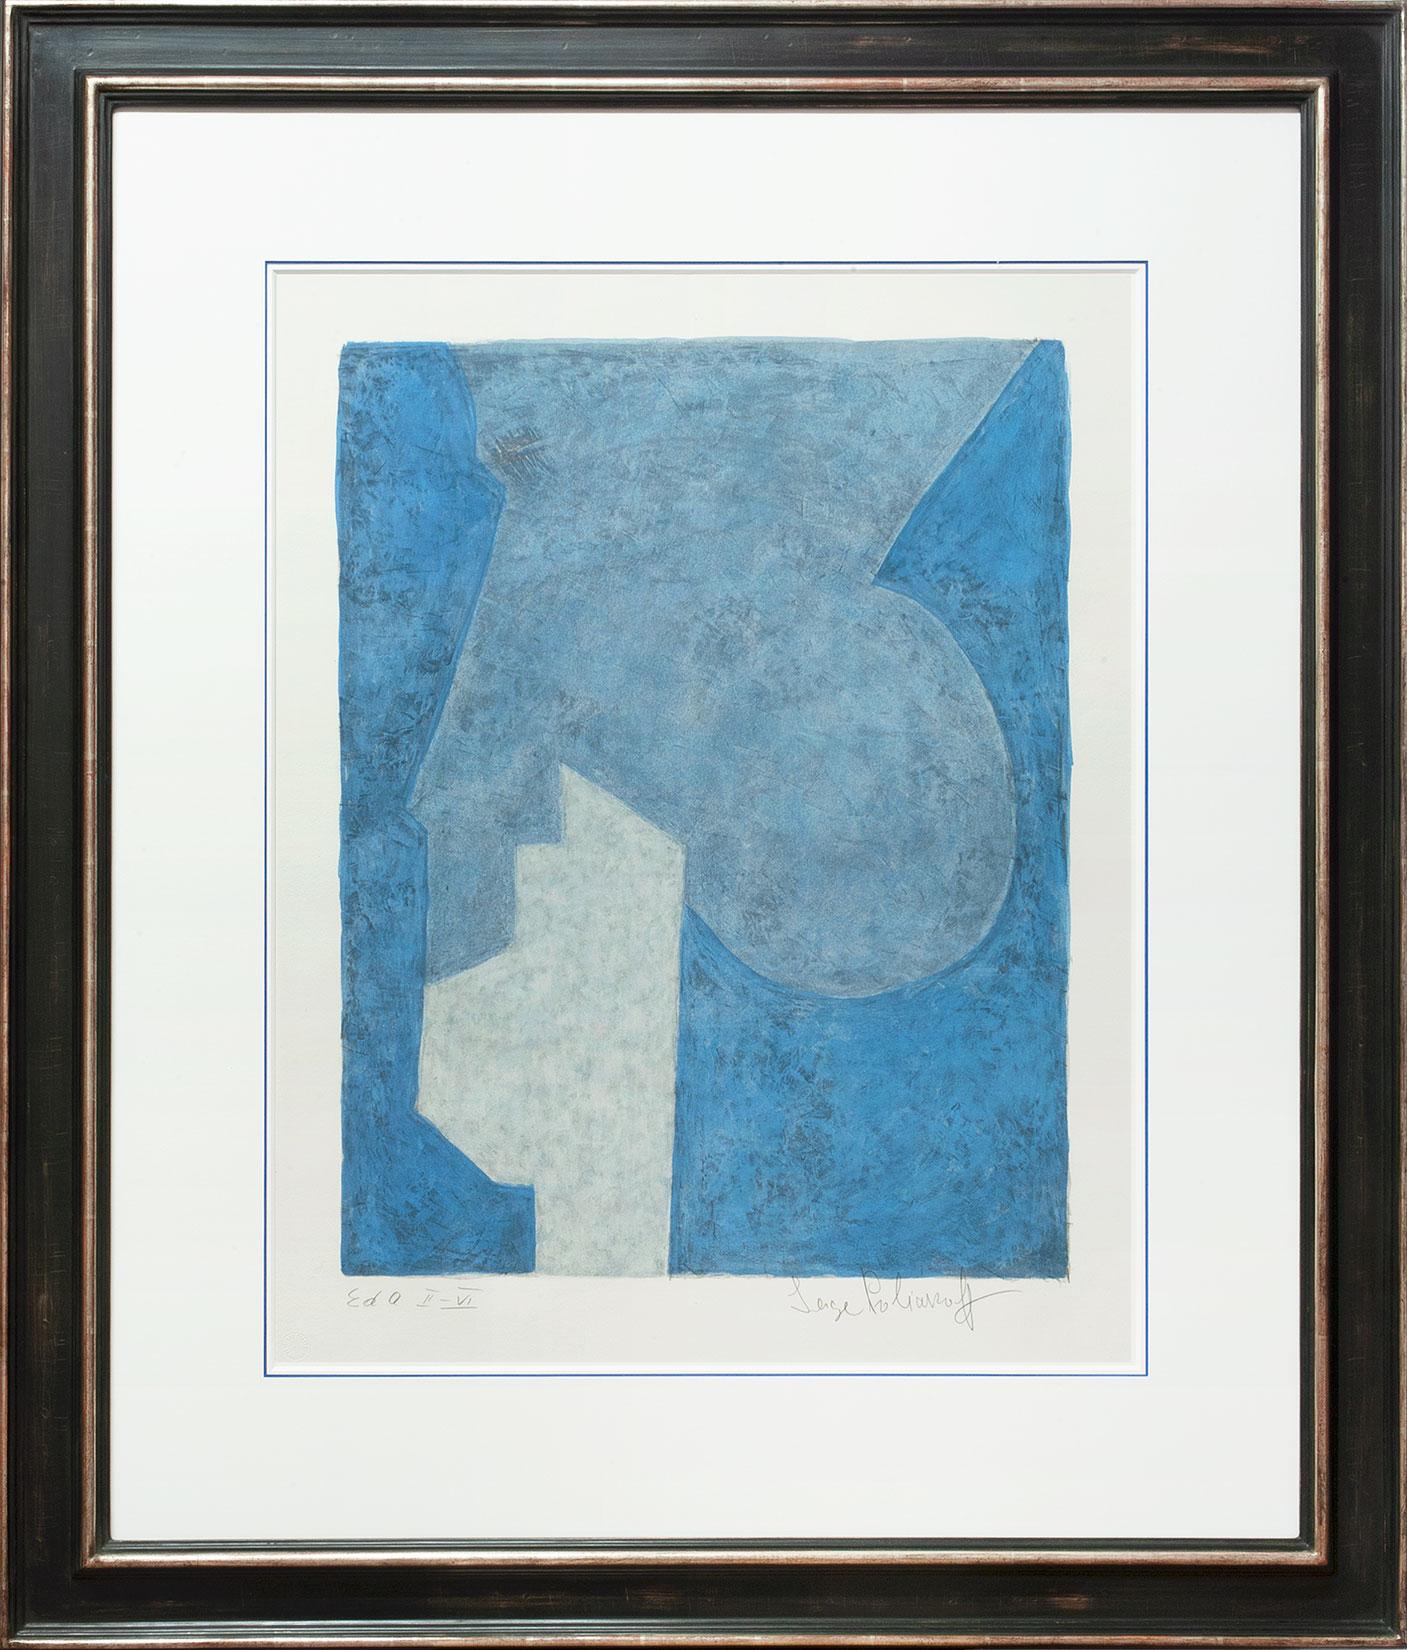 Serge Poliakoff « Composition bleu » Galerie Française